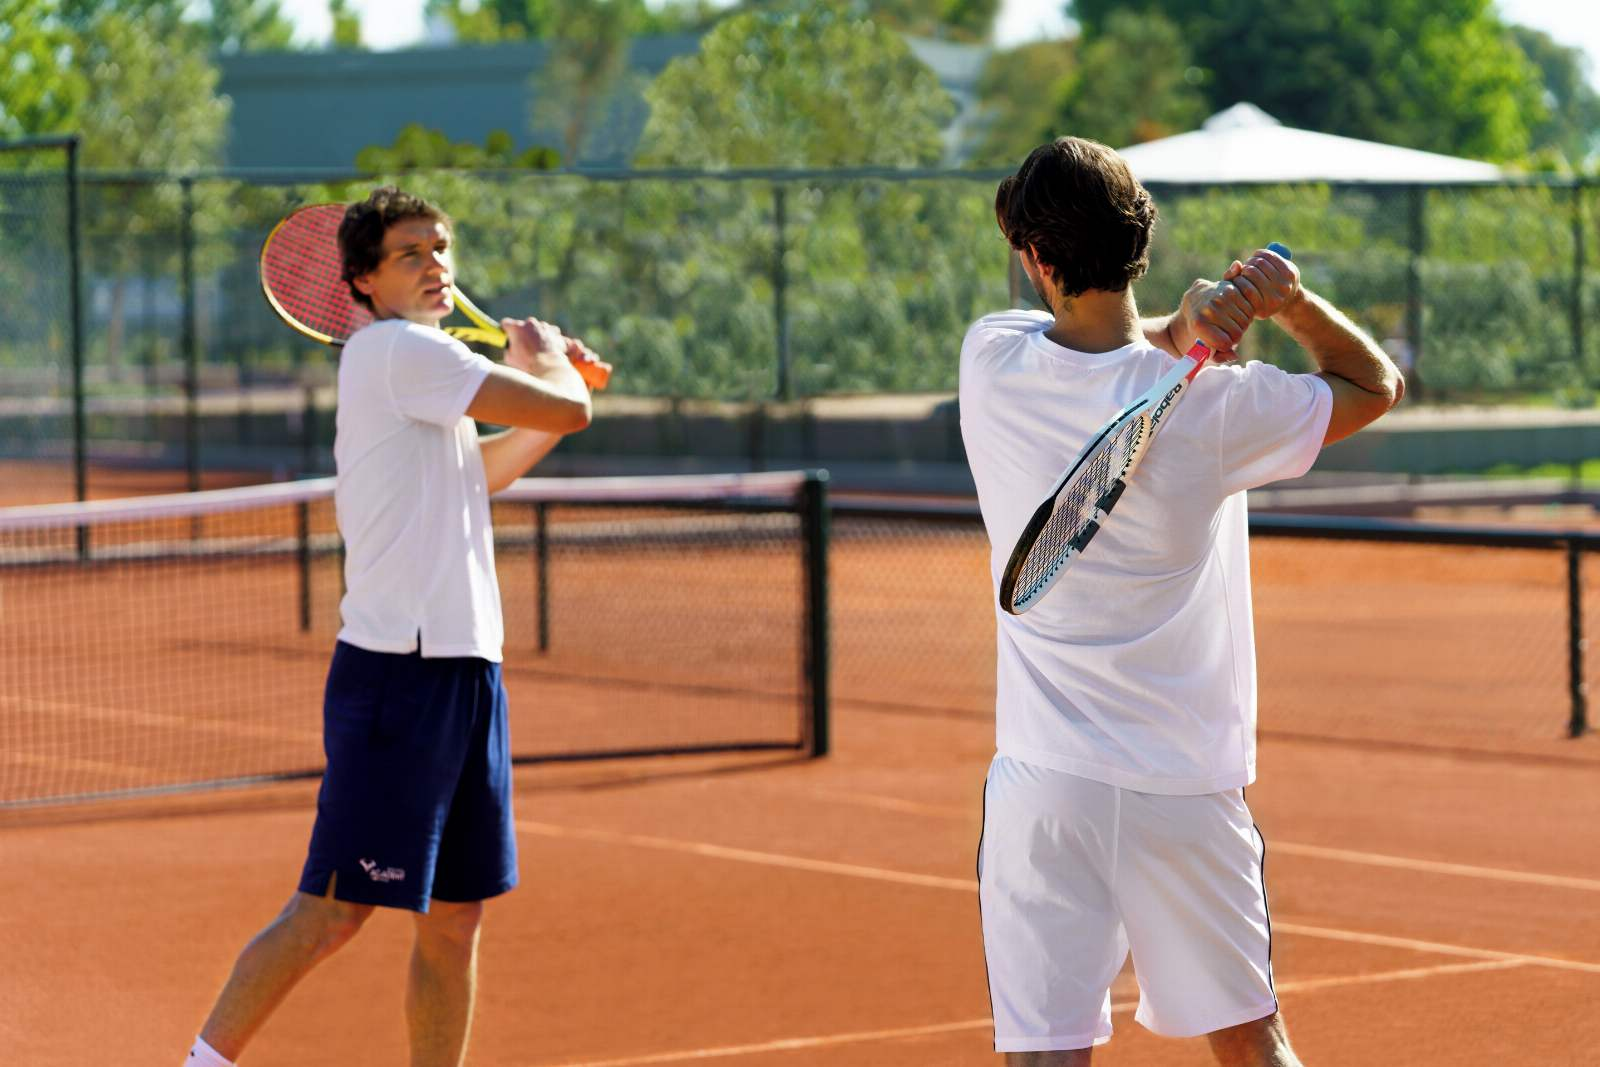 Sani Resort - Rafa Nadal Tennis Centre